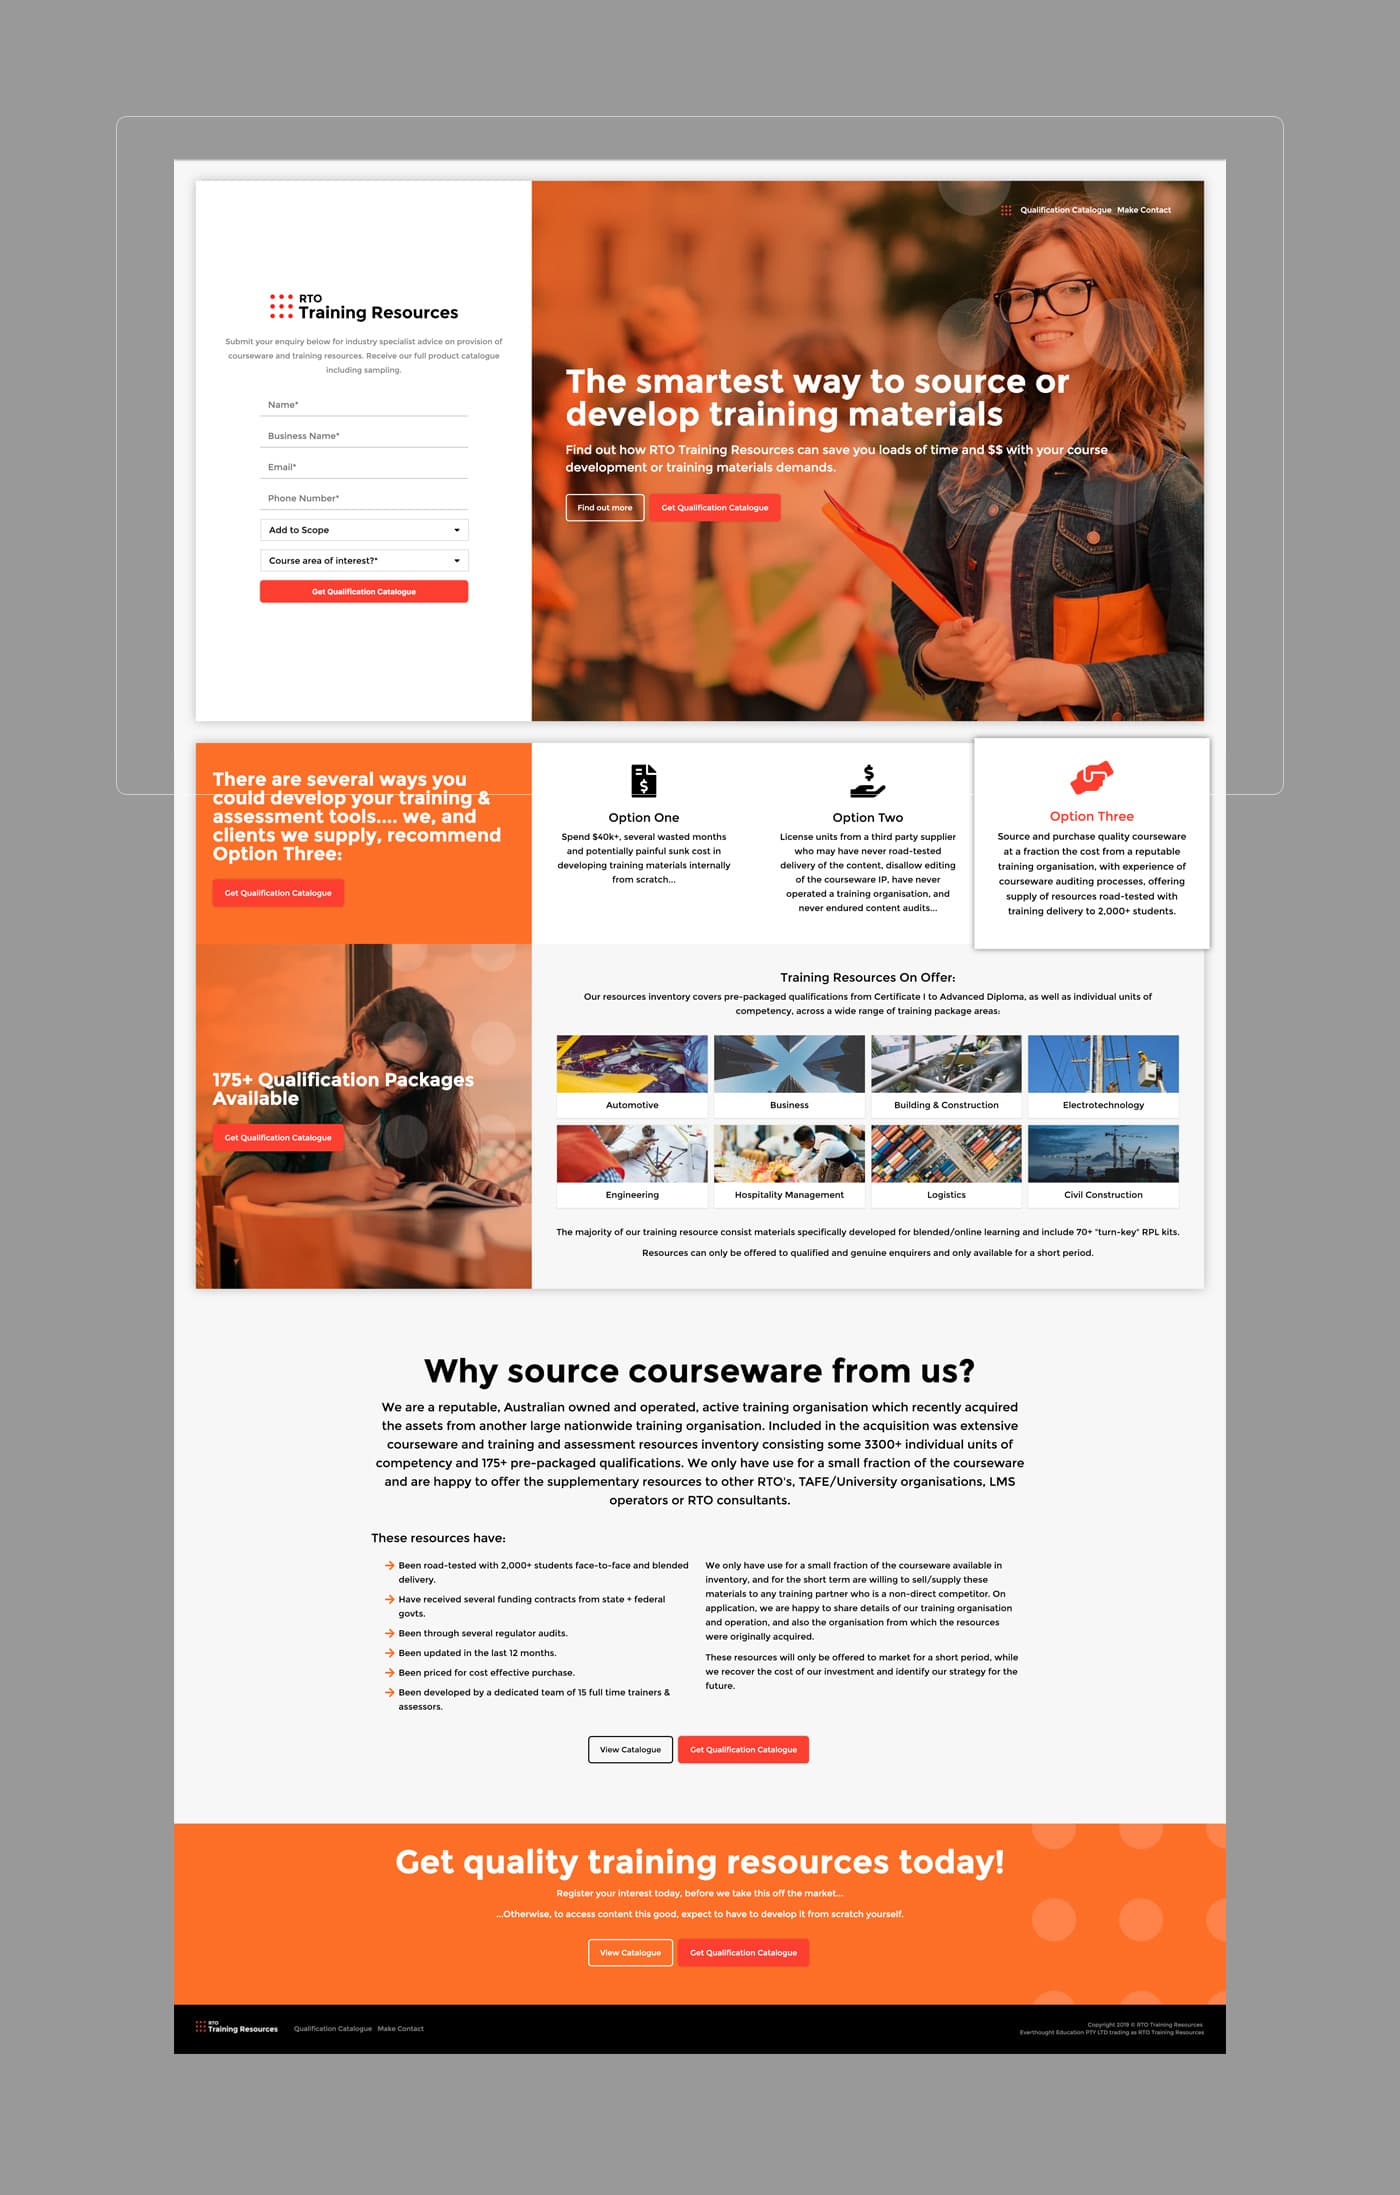 RTO Training Resources - Desktop - Homepage